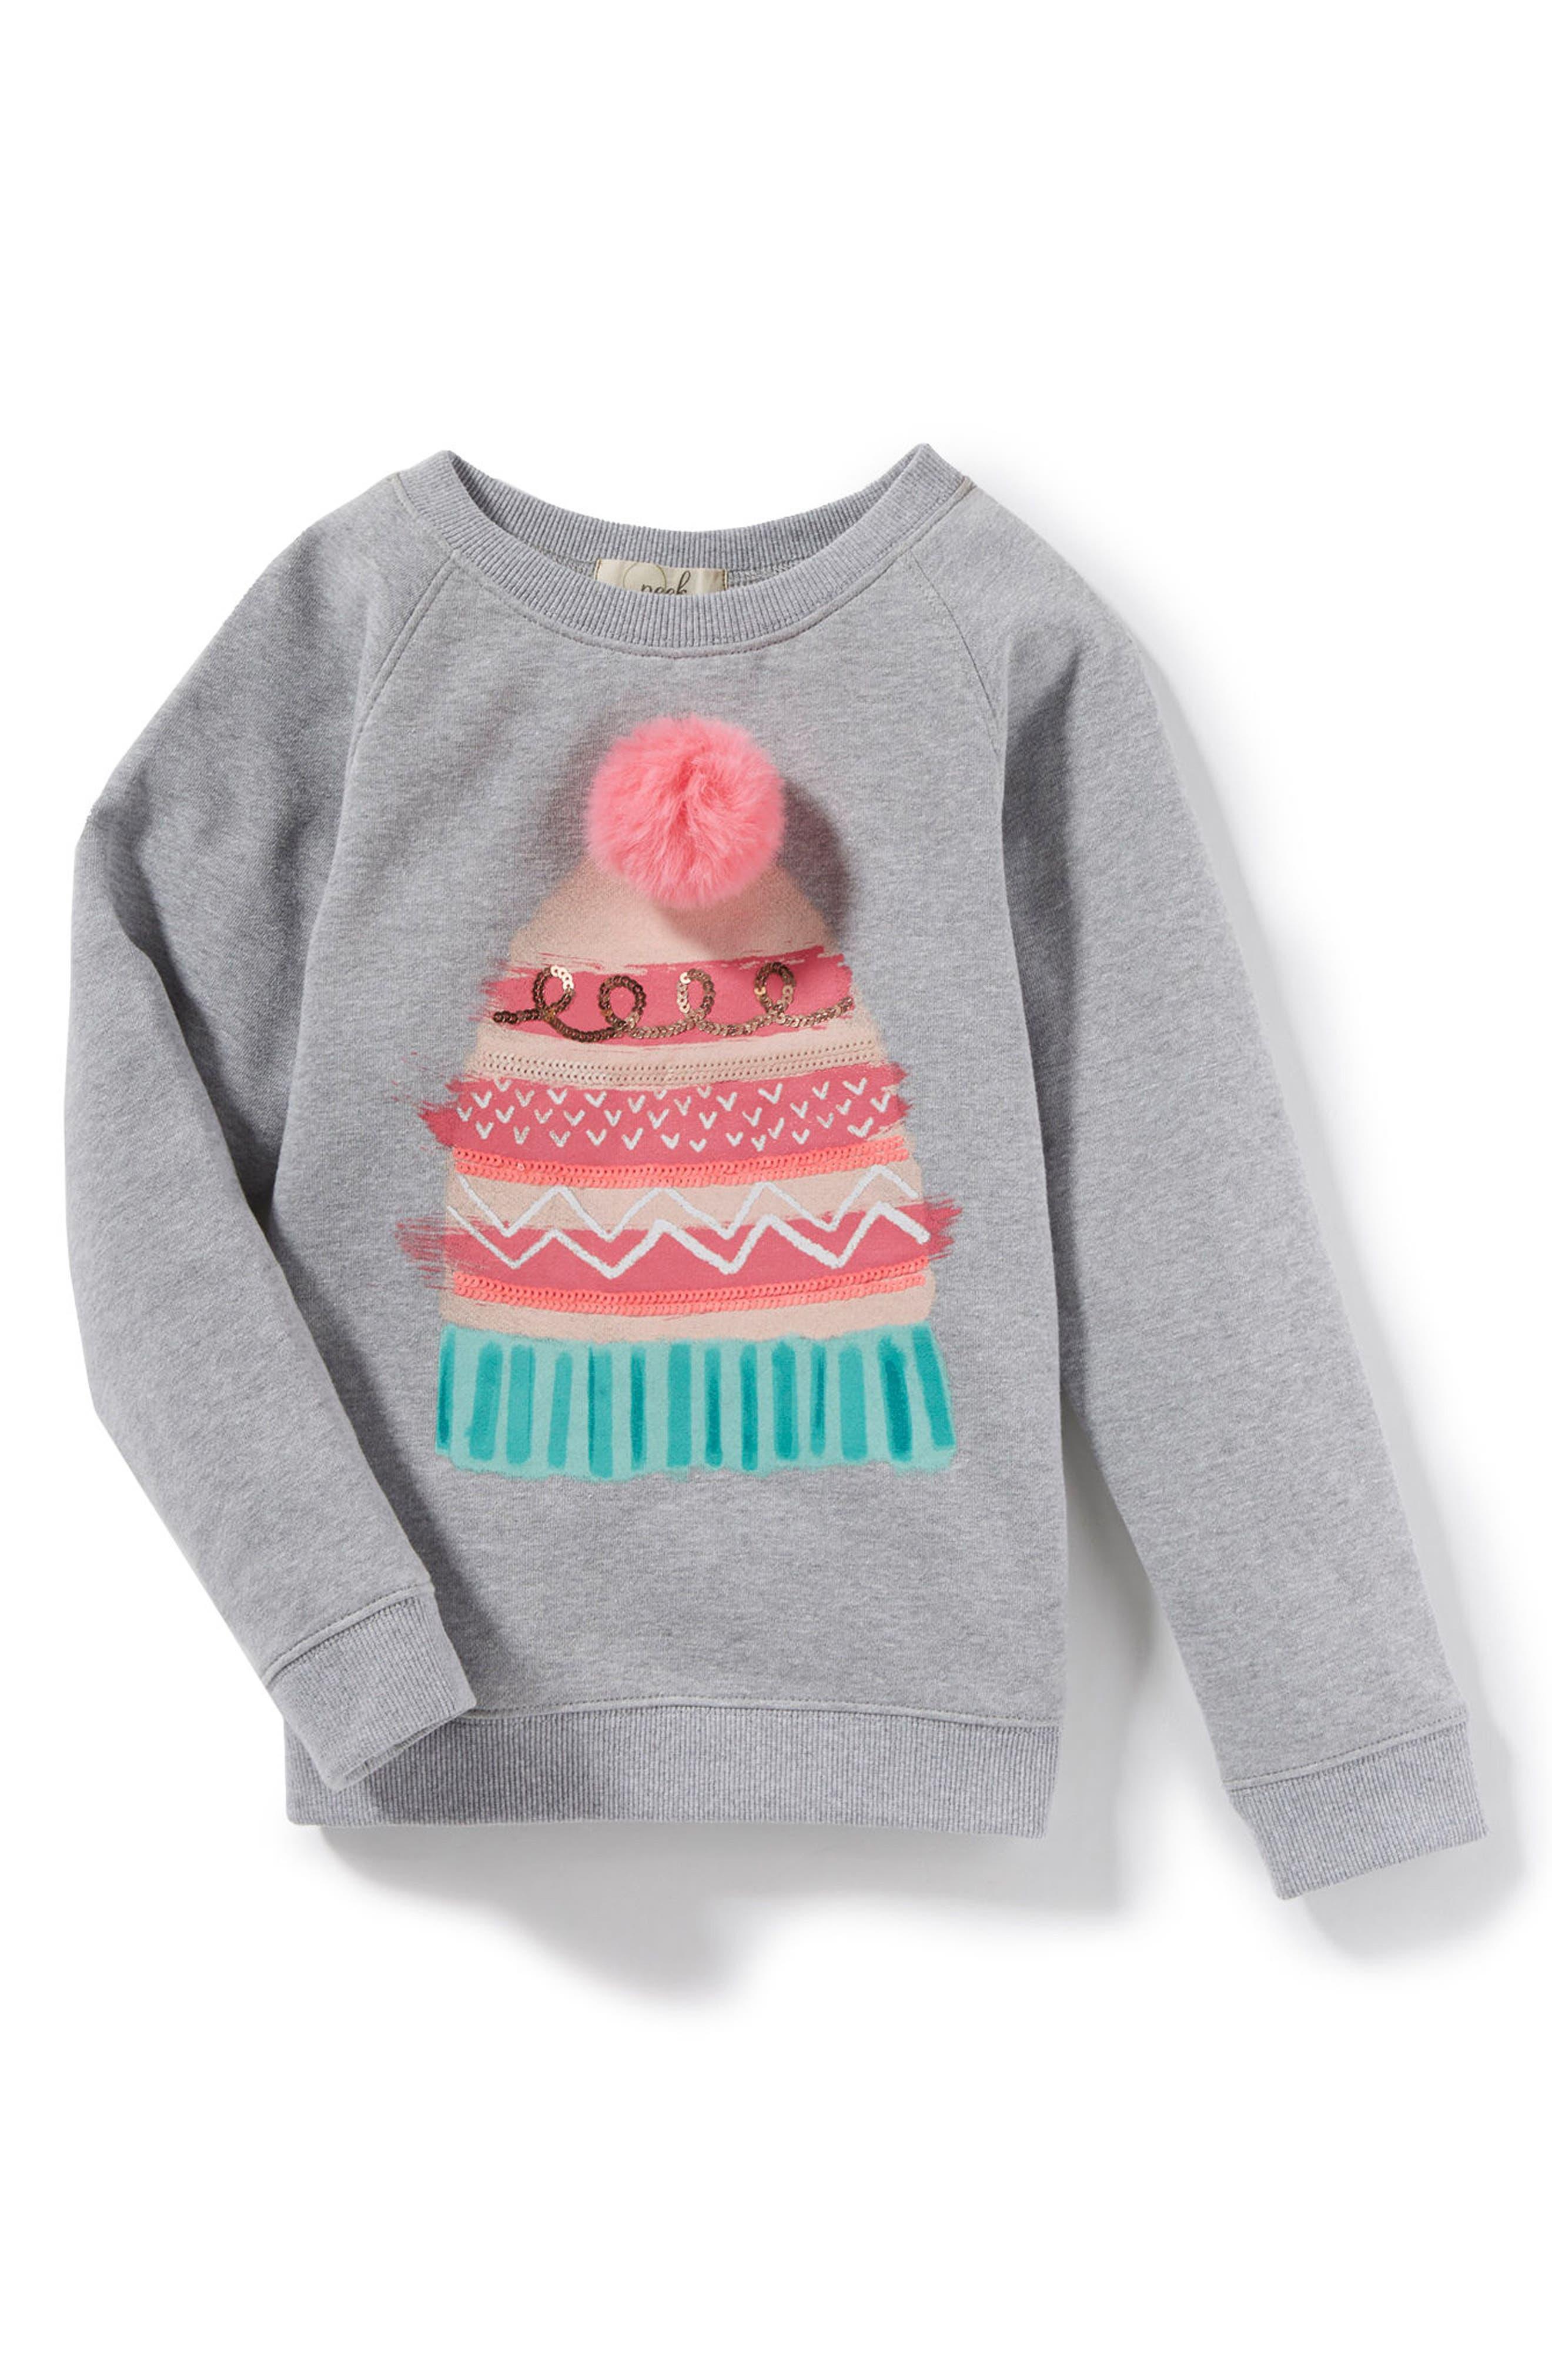 Hat Sweatshirt,                             Main thumbnail 1, color,                             Grey Heather